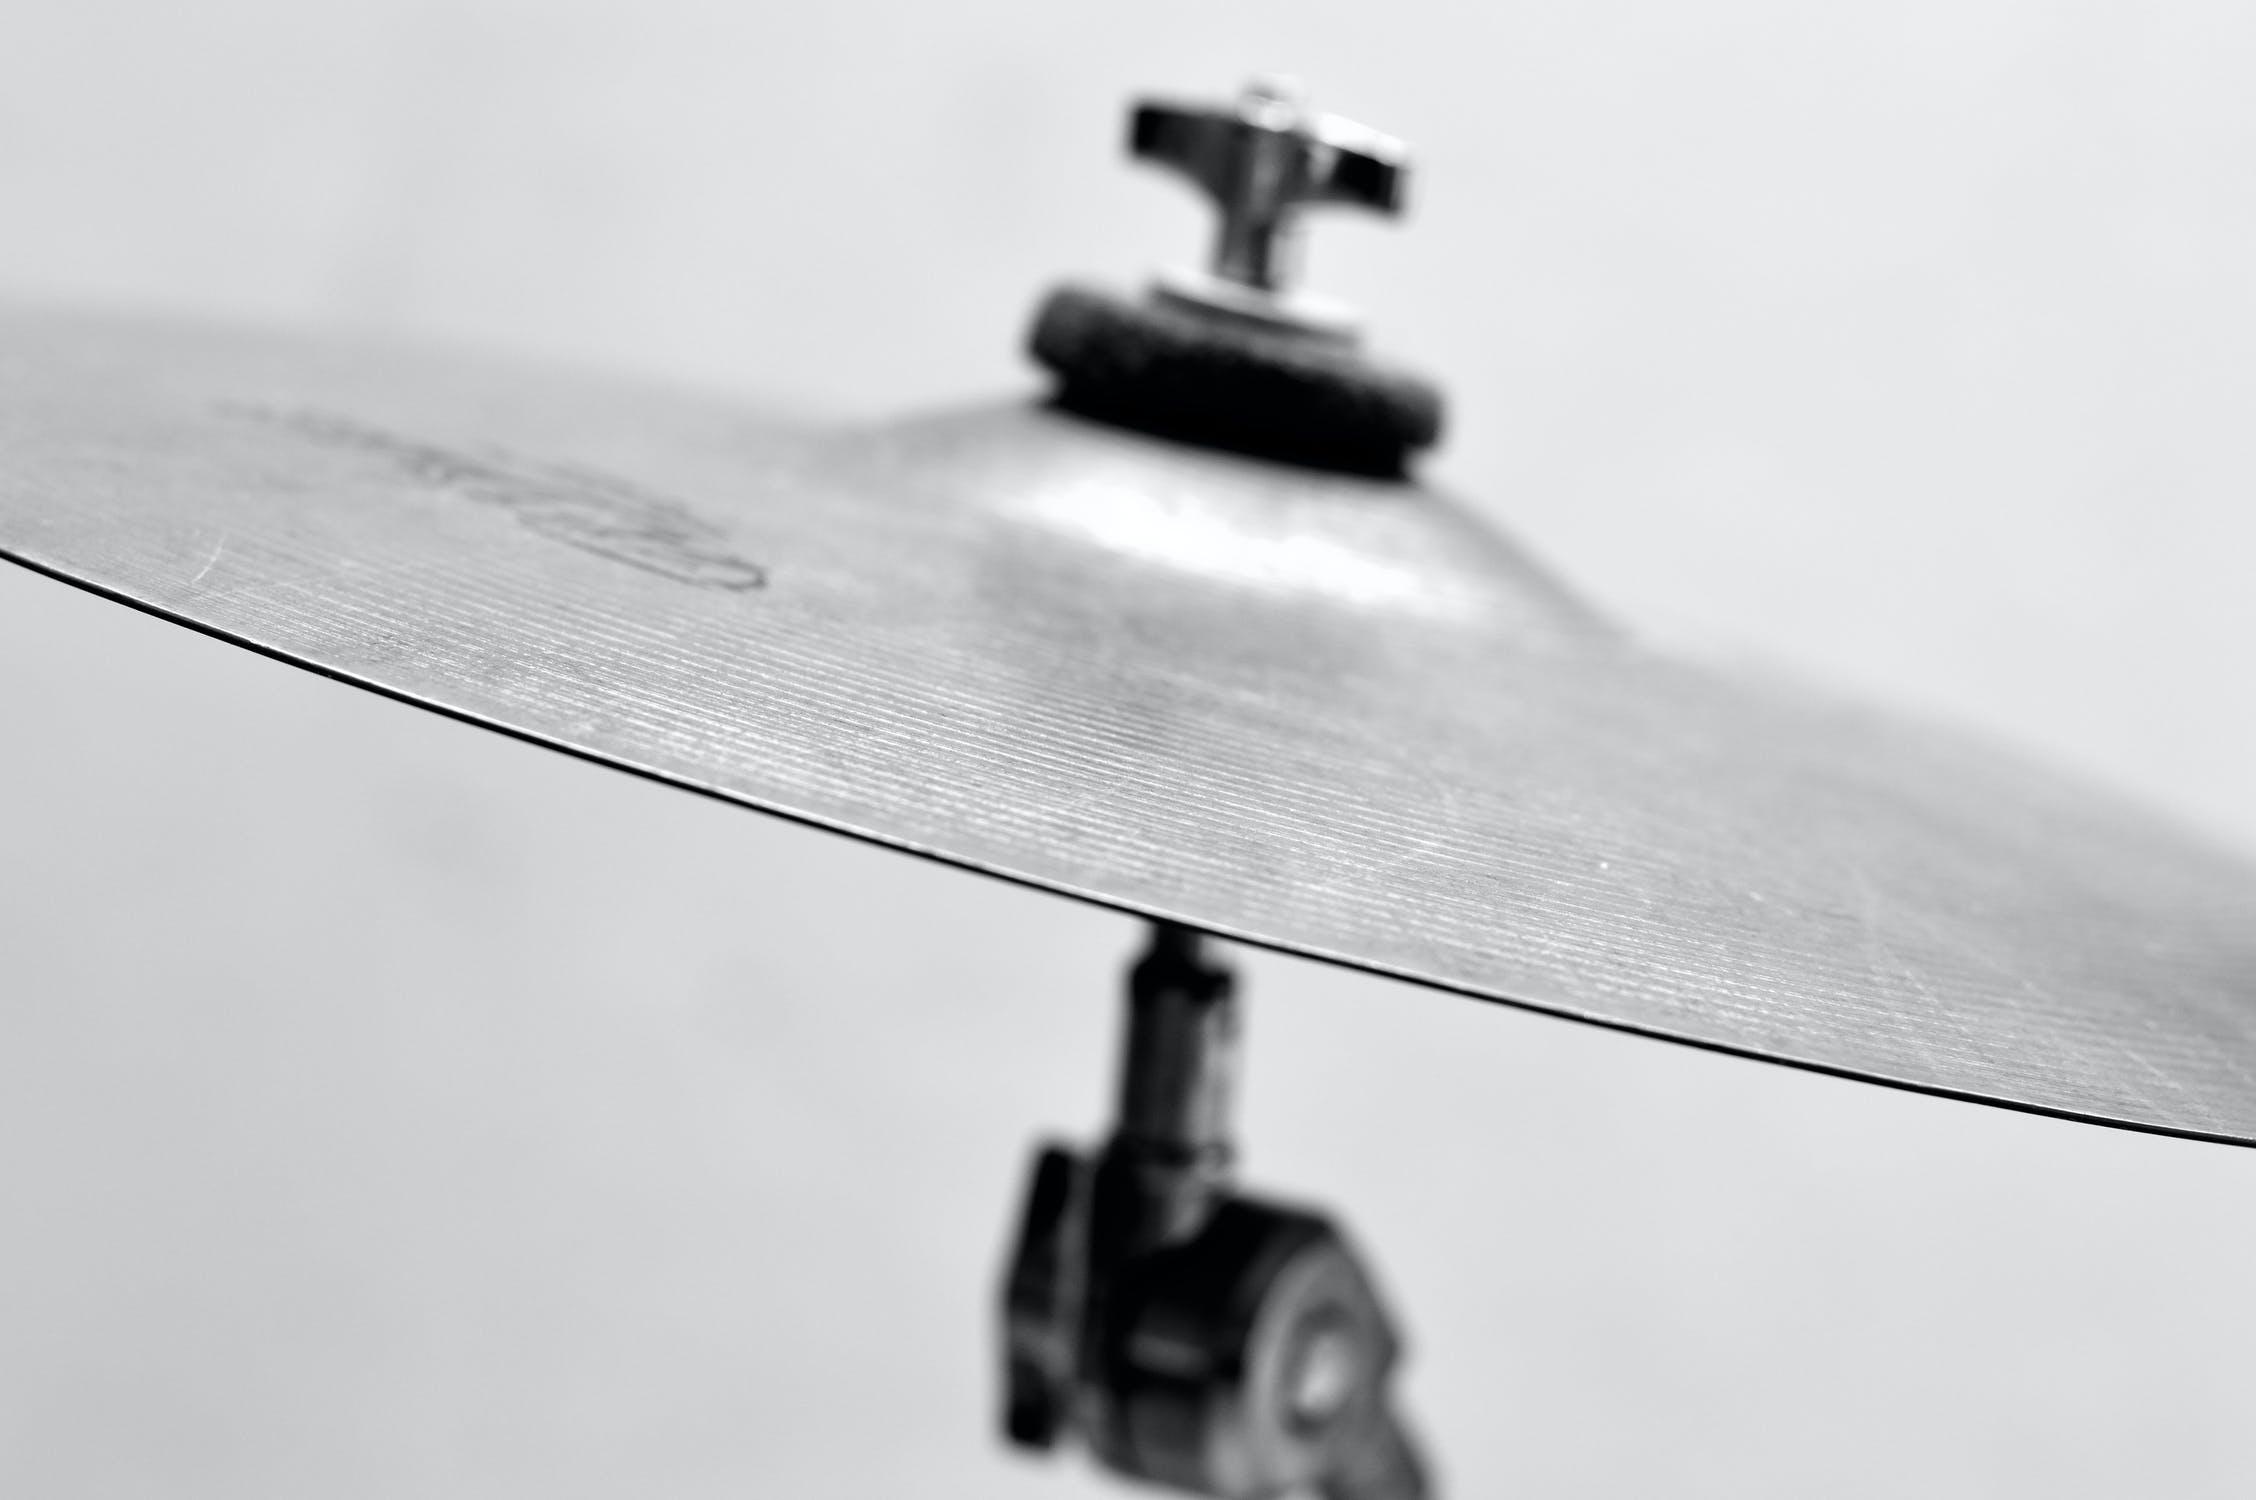 kanade sato sabian cymbals